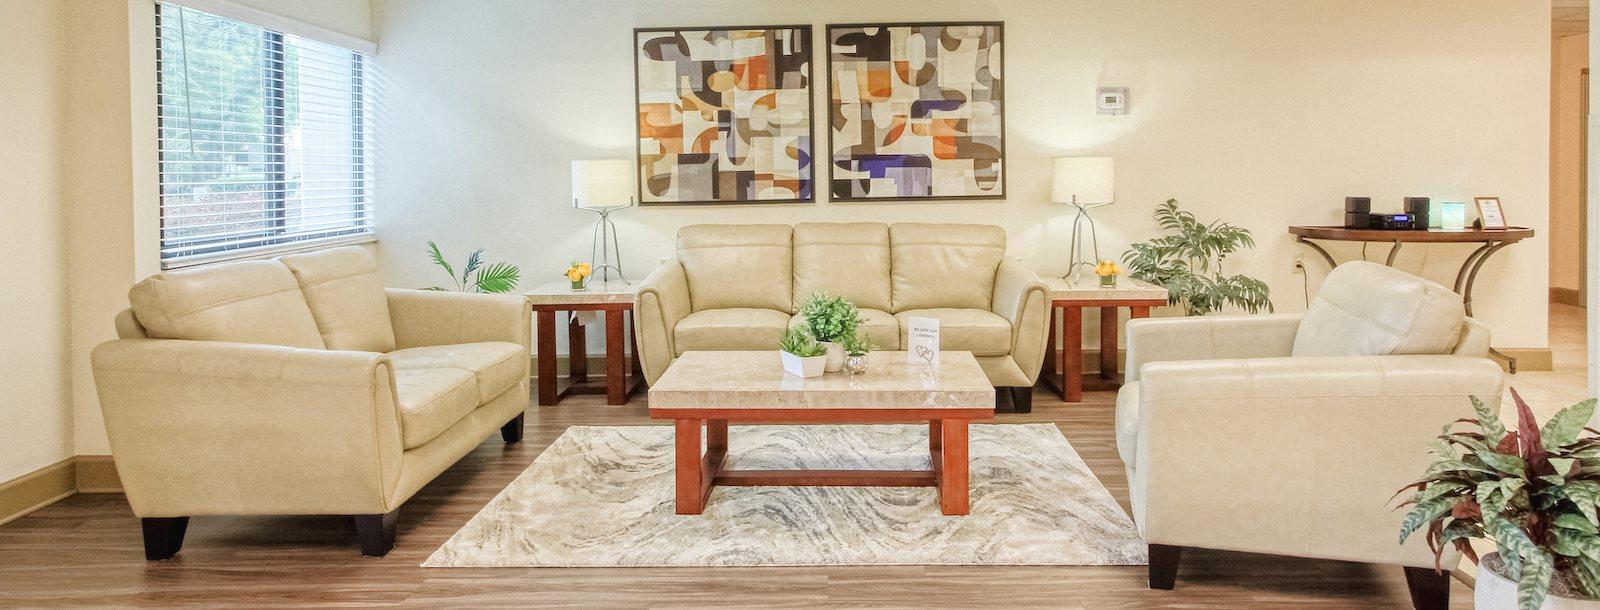 spacious lobby with plush furnishings and nice decor at Orlando Cloisters Senior Apartments